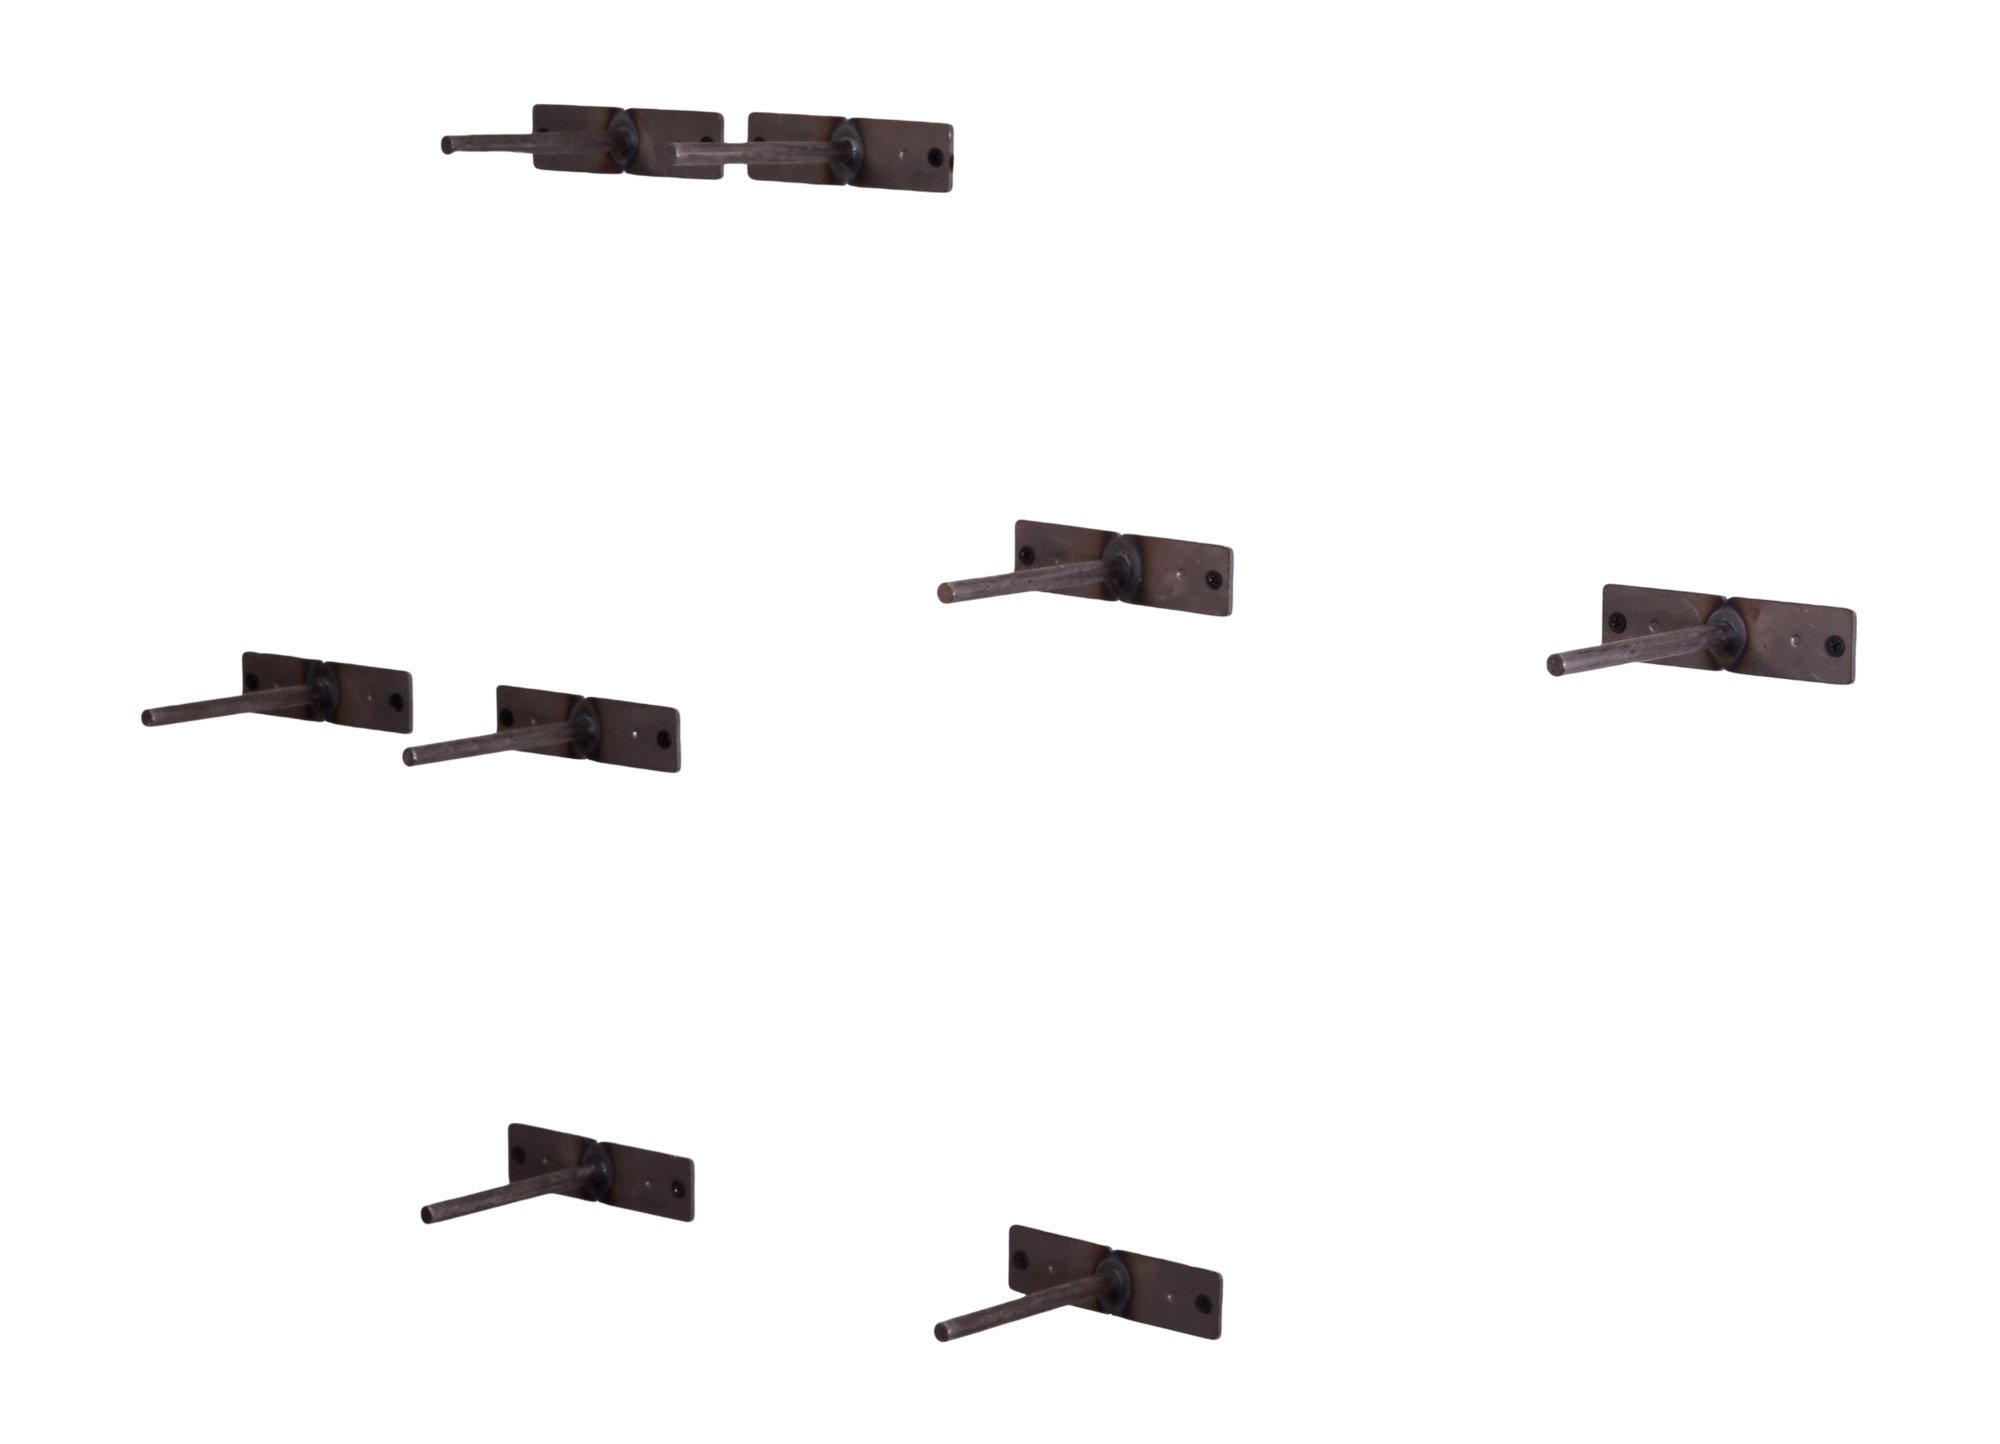 DAKODA LOVE Routed Edge Floating Shelves, USA Handmade, Clear Coat Finish, 100% Countersunk Hidden Floating Shelf Brackets, Beautiful Grain Pine Wood Wall Decor (Set of 4) (Bourbon) by DAKODA LOVE (Image #5)